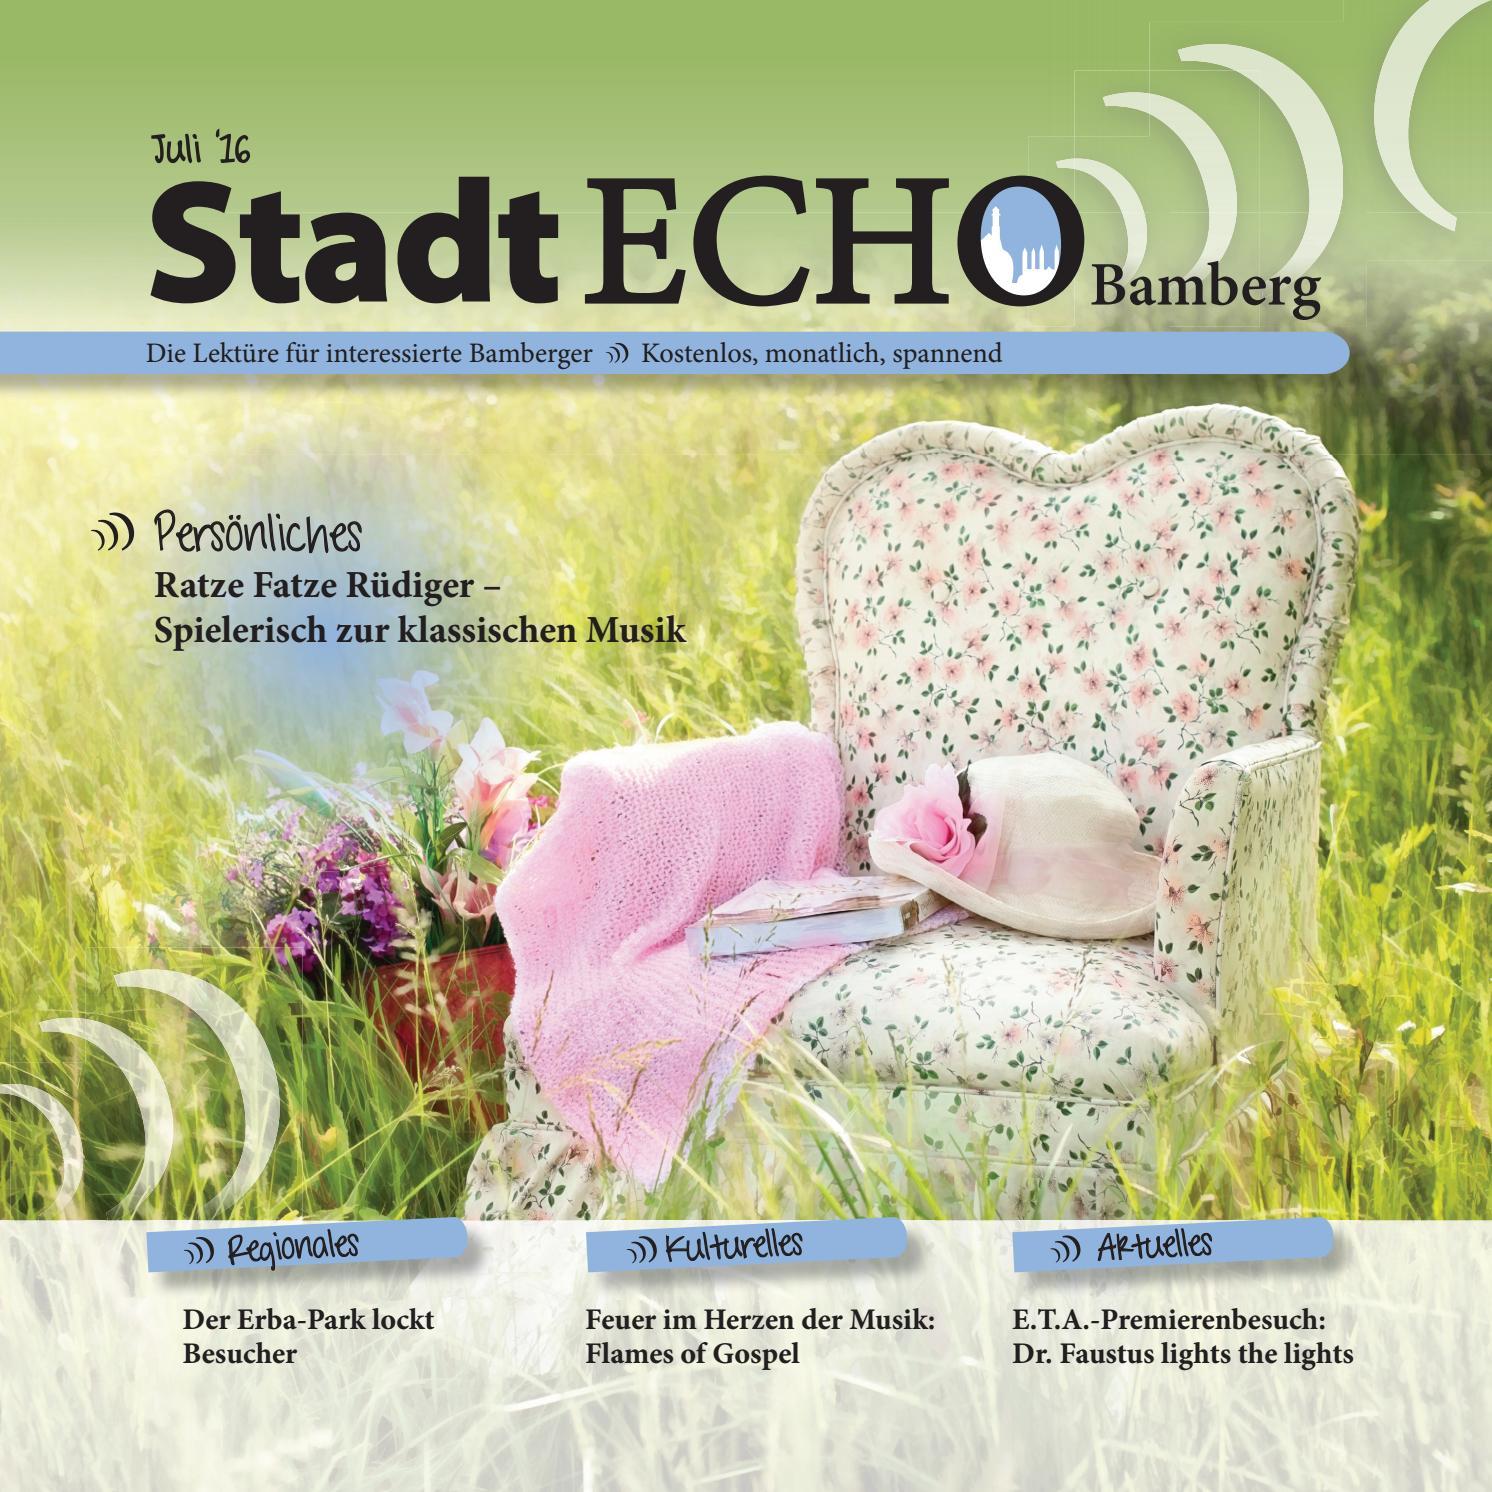 StadtECHO Bamberg Ausgabe 07 2016 by StadtECHO Bamberg - issuu